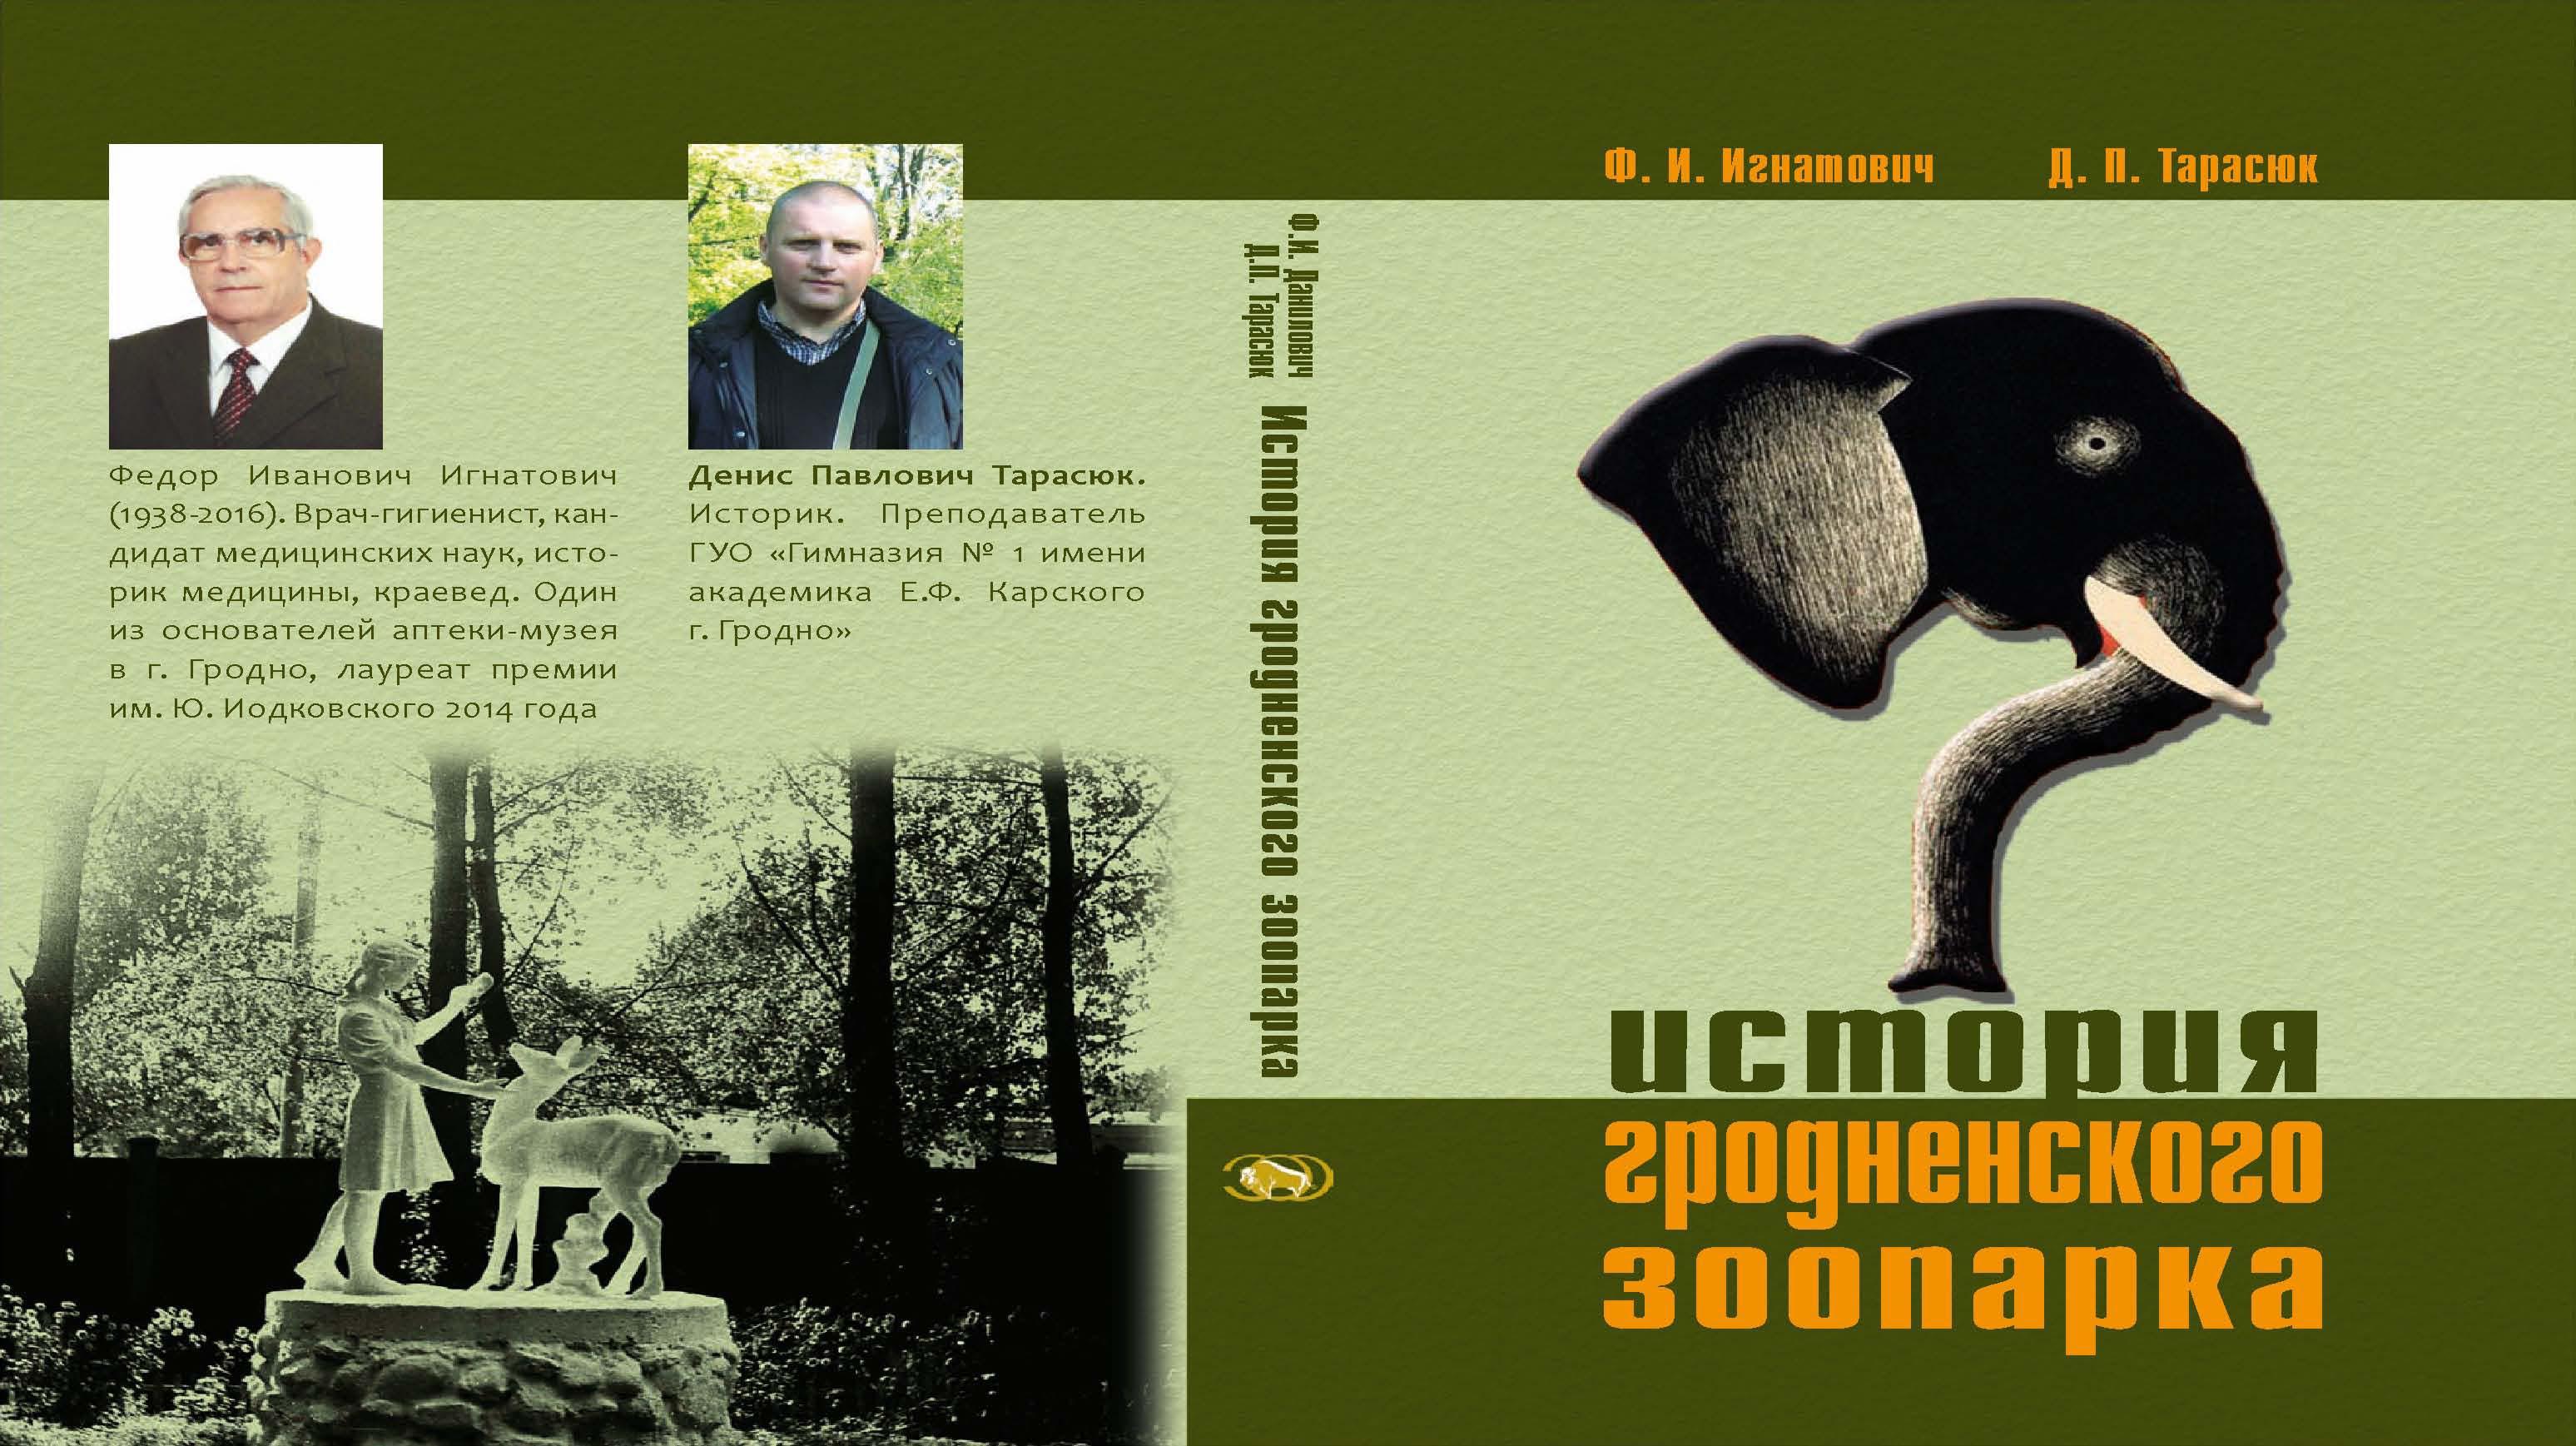 Ф. И. Игнатович, Д. П. Тарасюк; «ИСТОРИЯ ГРОДНЕНСКОГО ЗООПАРКА»